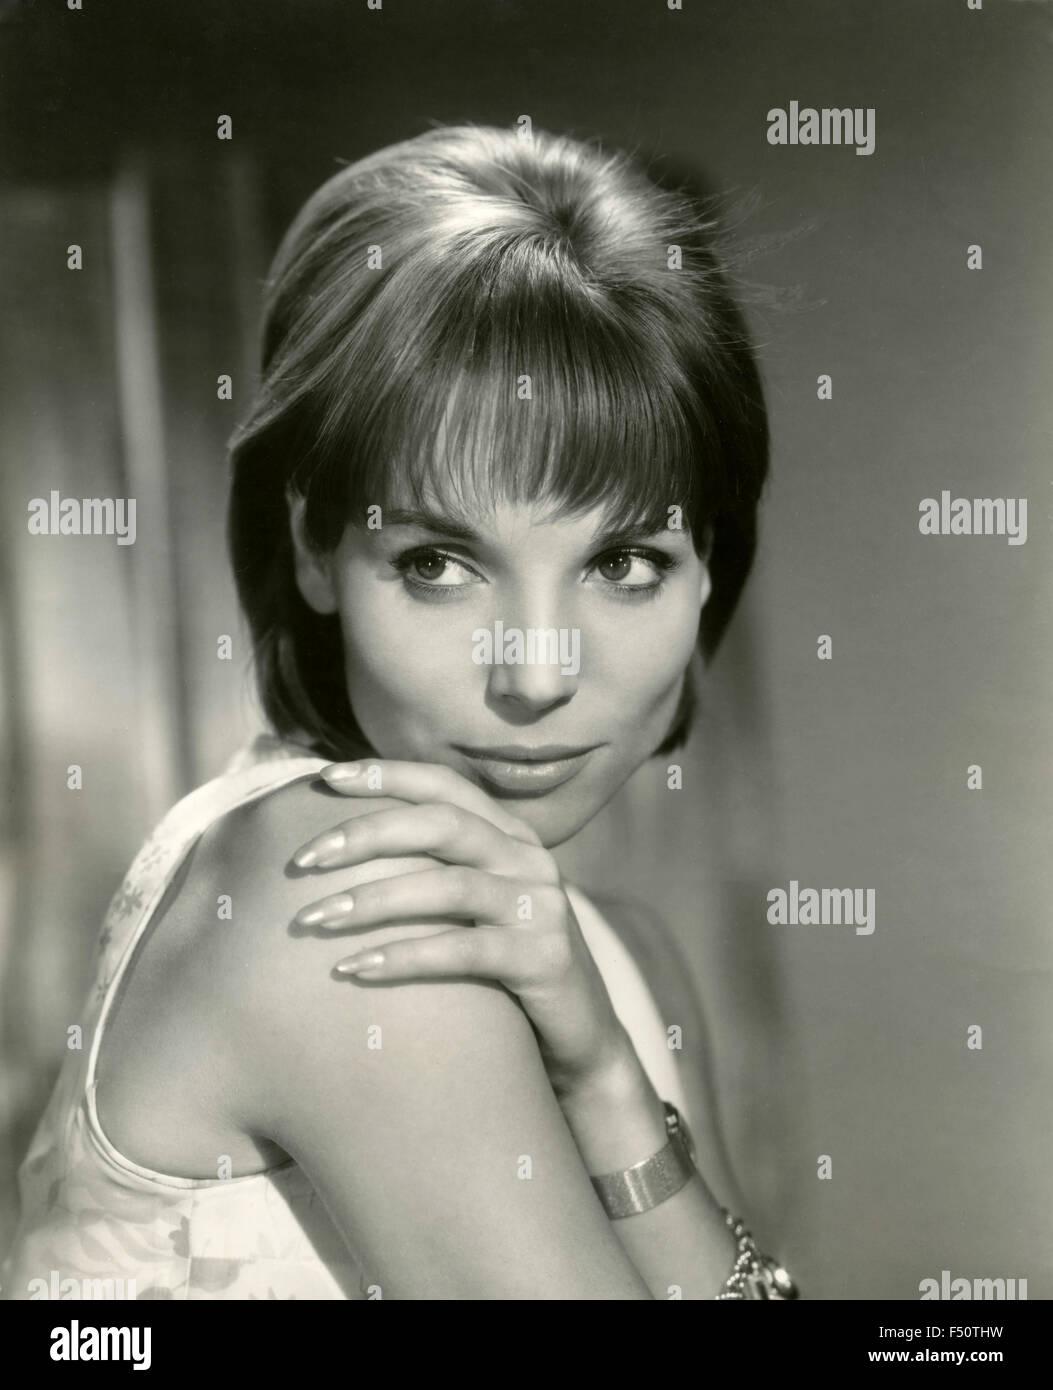 The Italian actress Elsa Martinelli in the movie 'Hatari!', USA - Stock Image